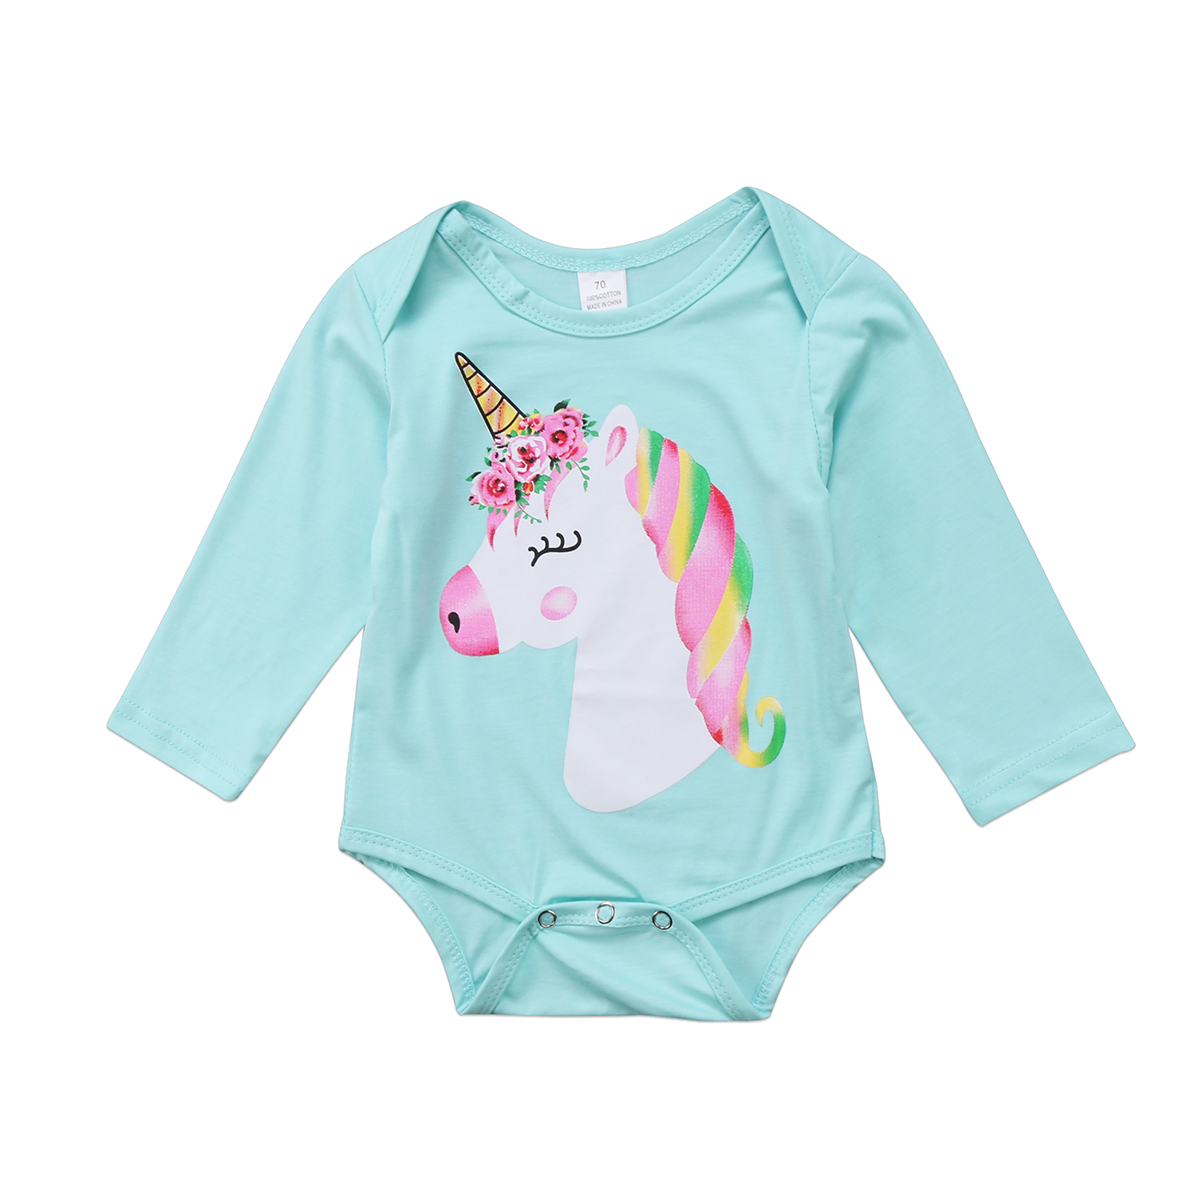 2017 Newborn Baby Girl Boy Unicorn Long Sleeves Jumpsuit ...